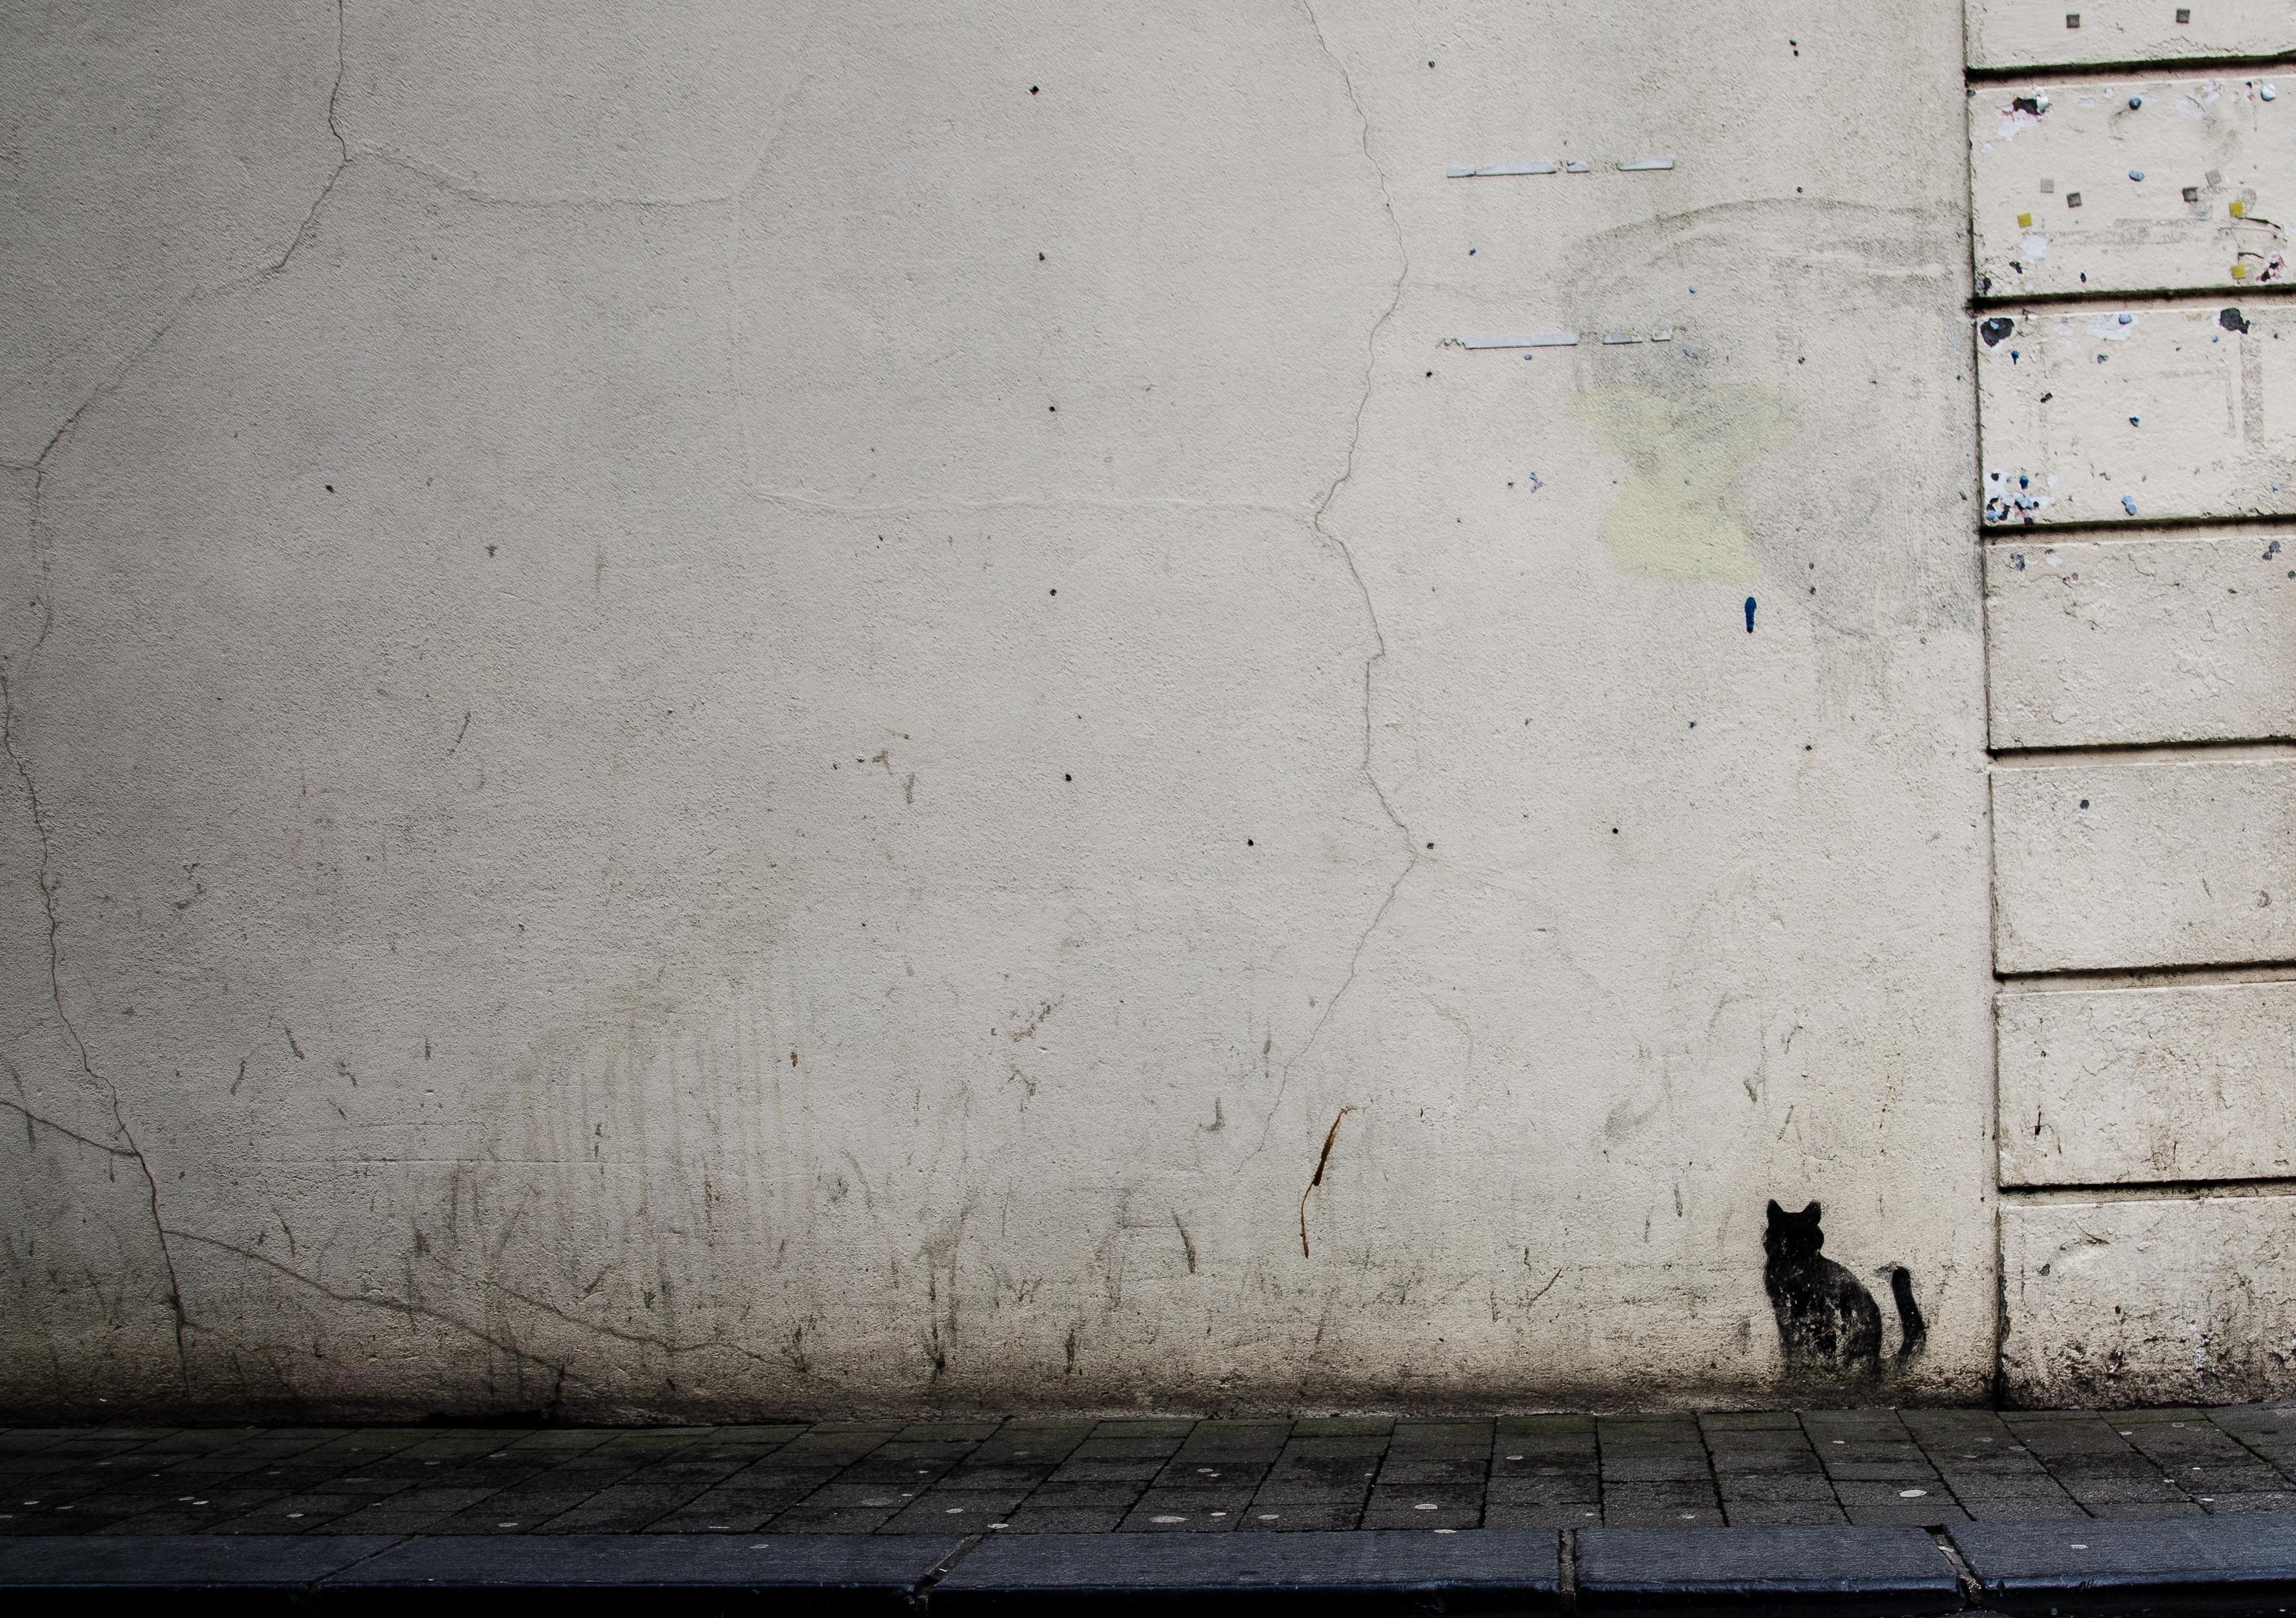 Textured, grungy white wall with mini black cat graffiti artwork in Kilkenny